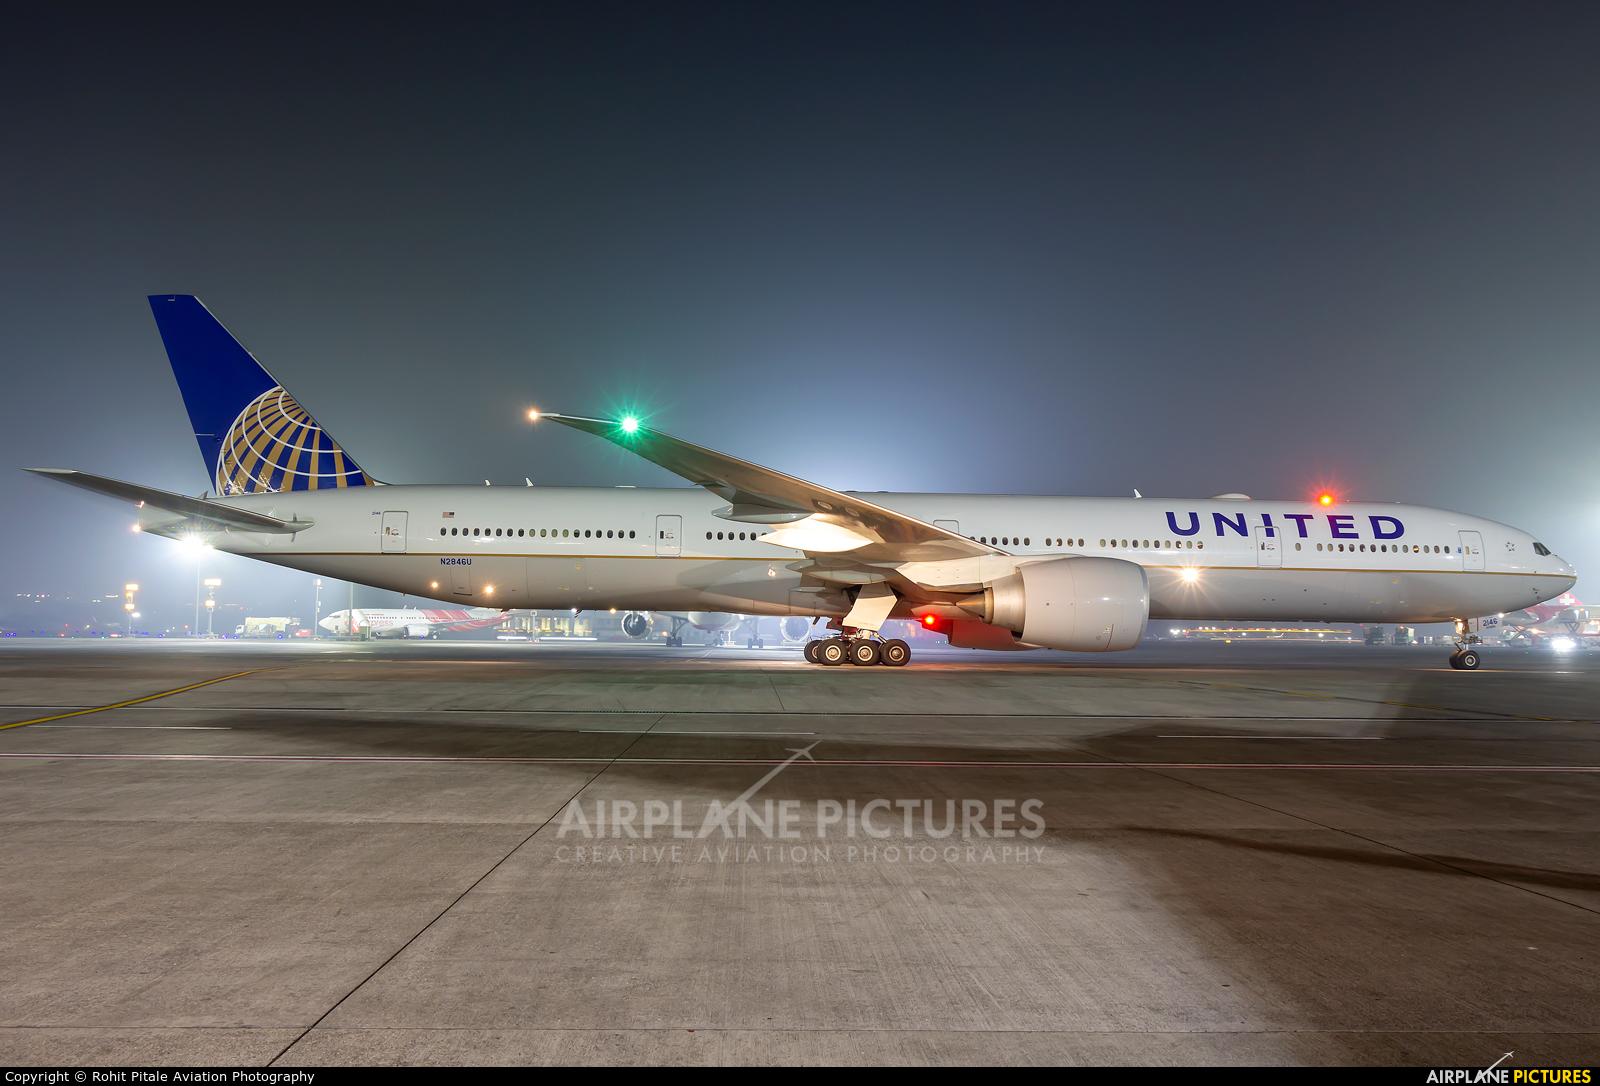 United Airlines N2846U aircraft at Mumbai - Chhatrapati Shivaji Intl